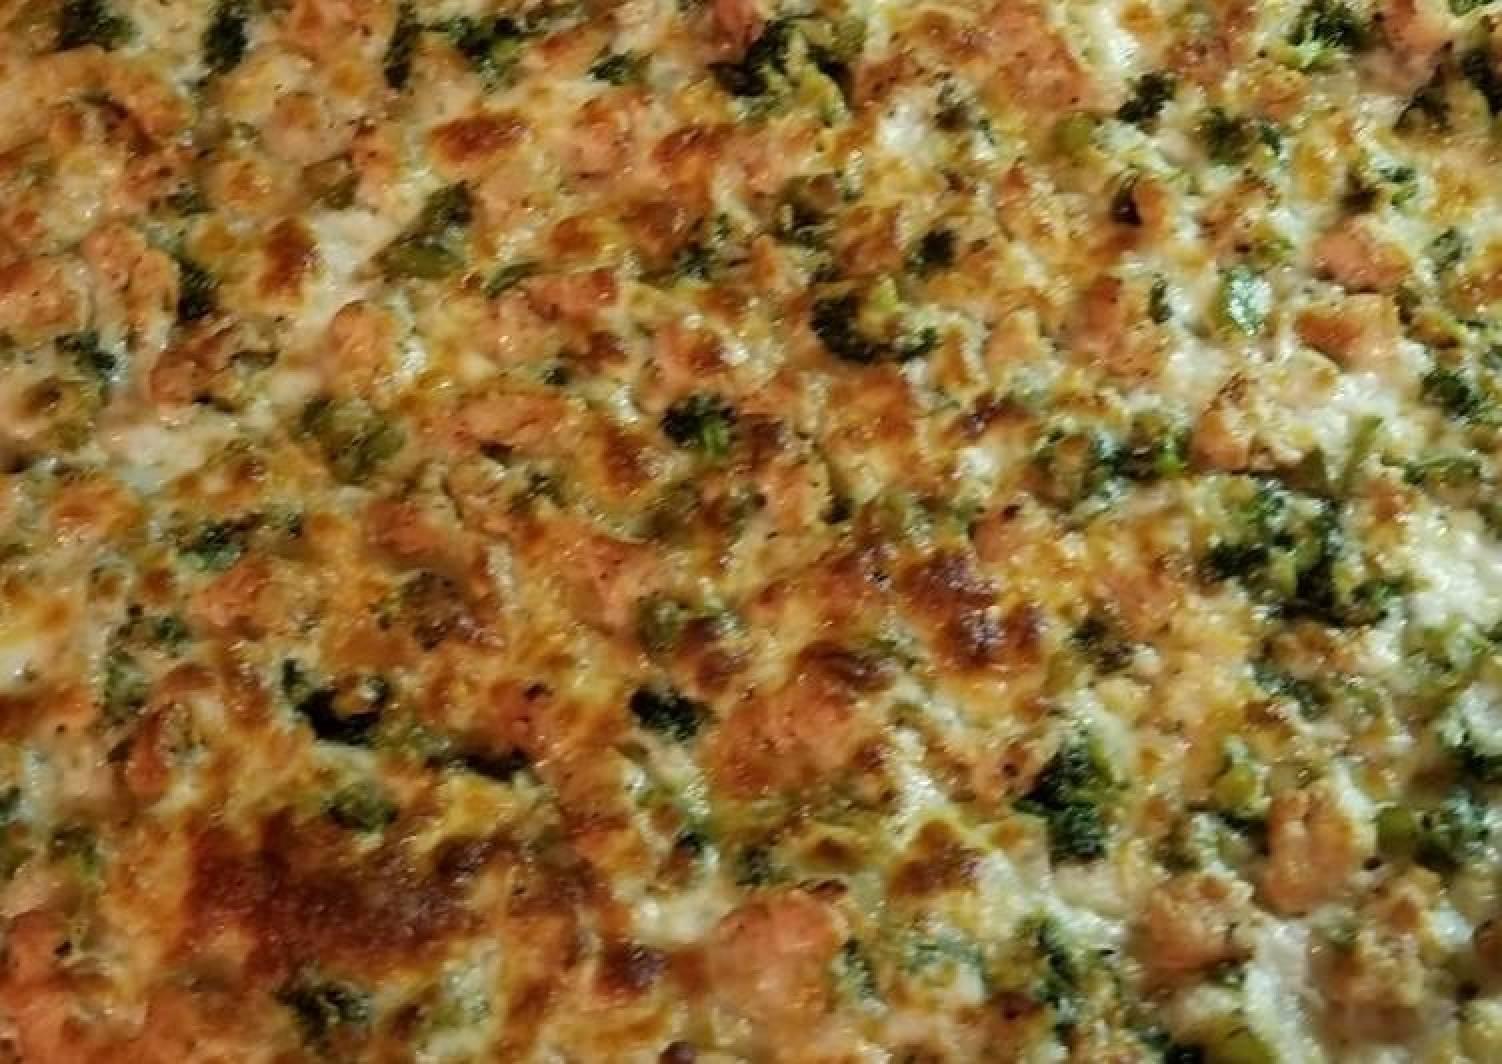 Sheik's Gourmet Pizza: Cajun Chicken Alfredo Pizza